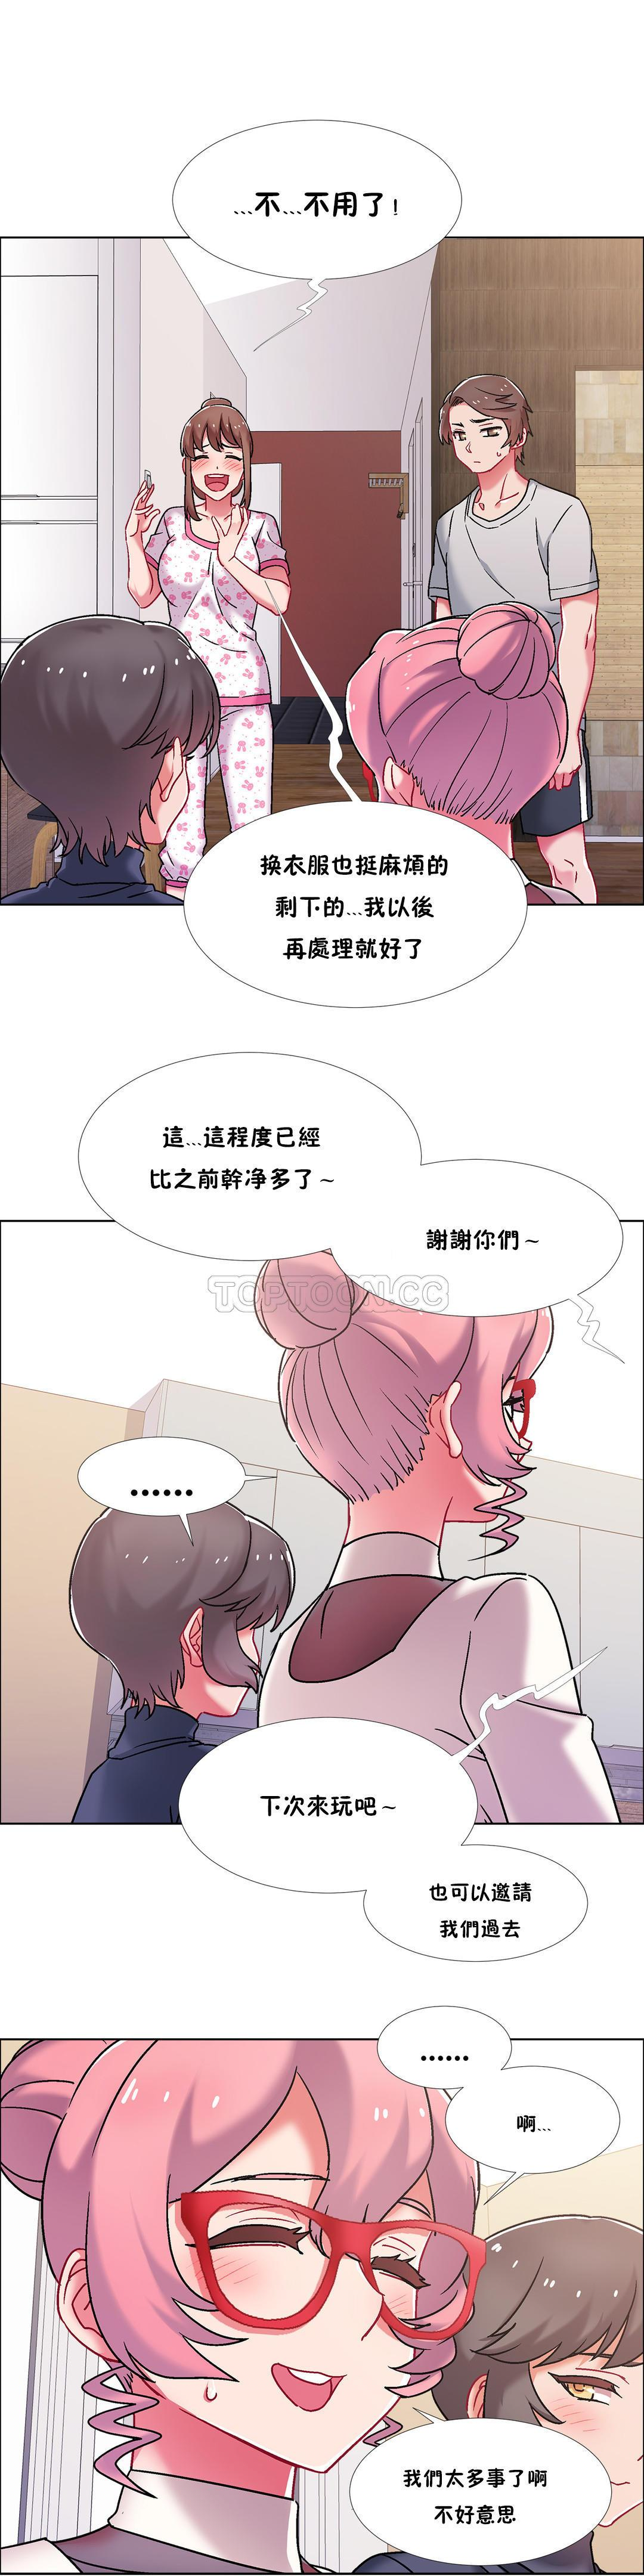 [Studio Wannabe] Rental Girls | 出租女郎 Ch. 33-58 [Chinese]  第二季 完结 260